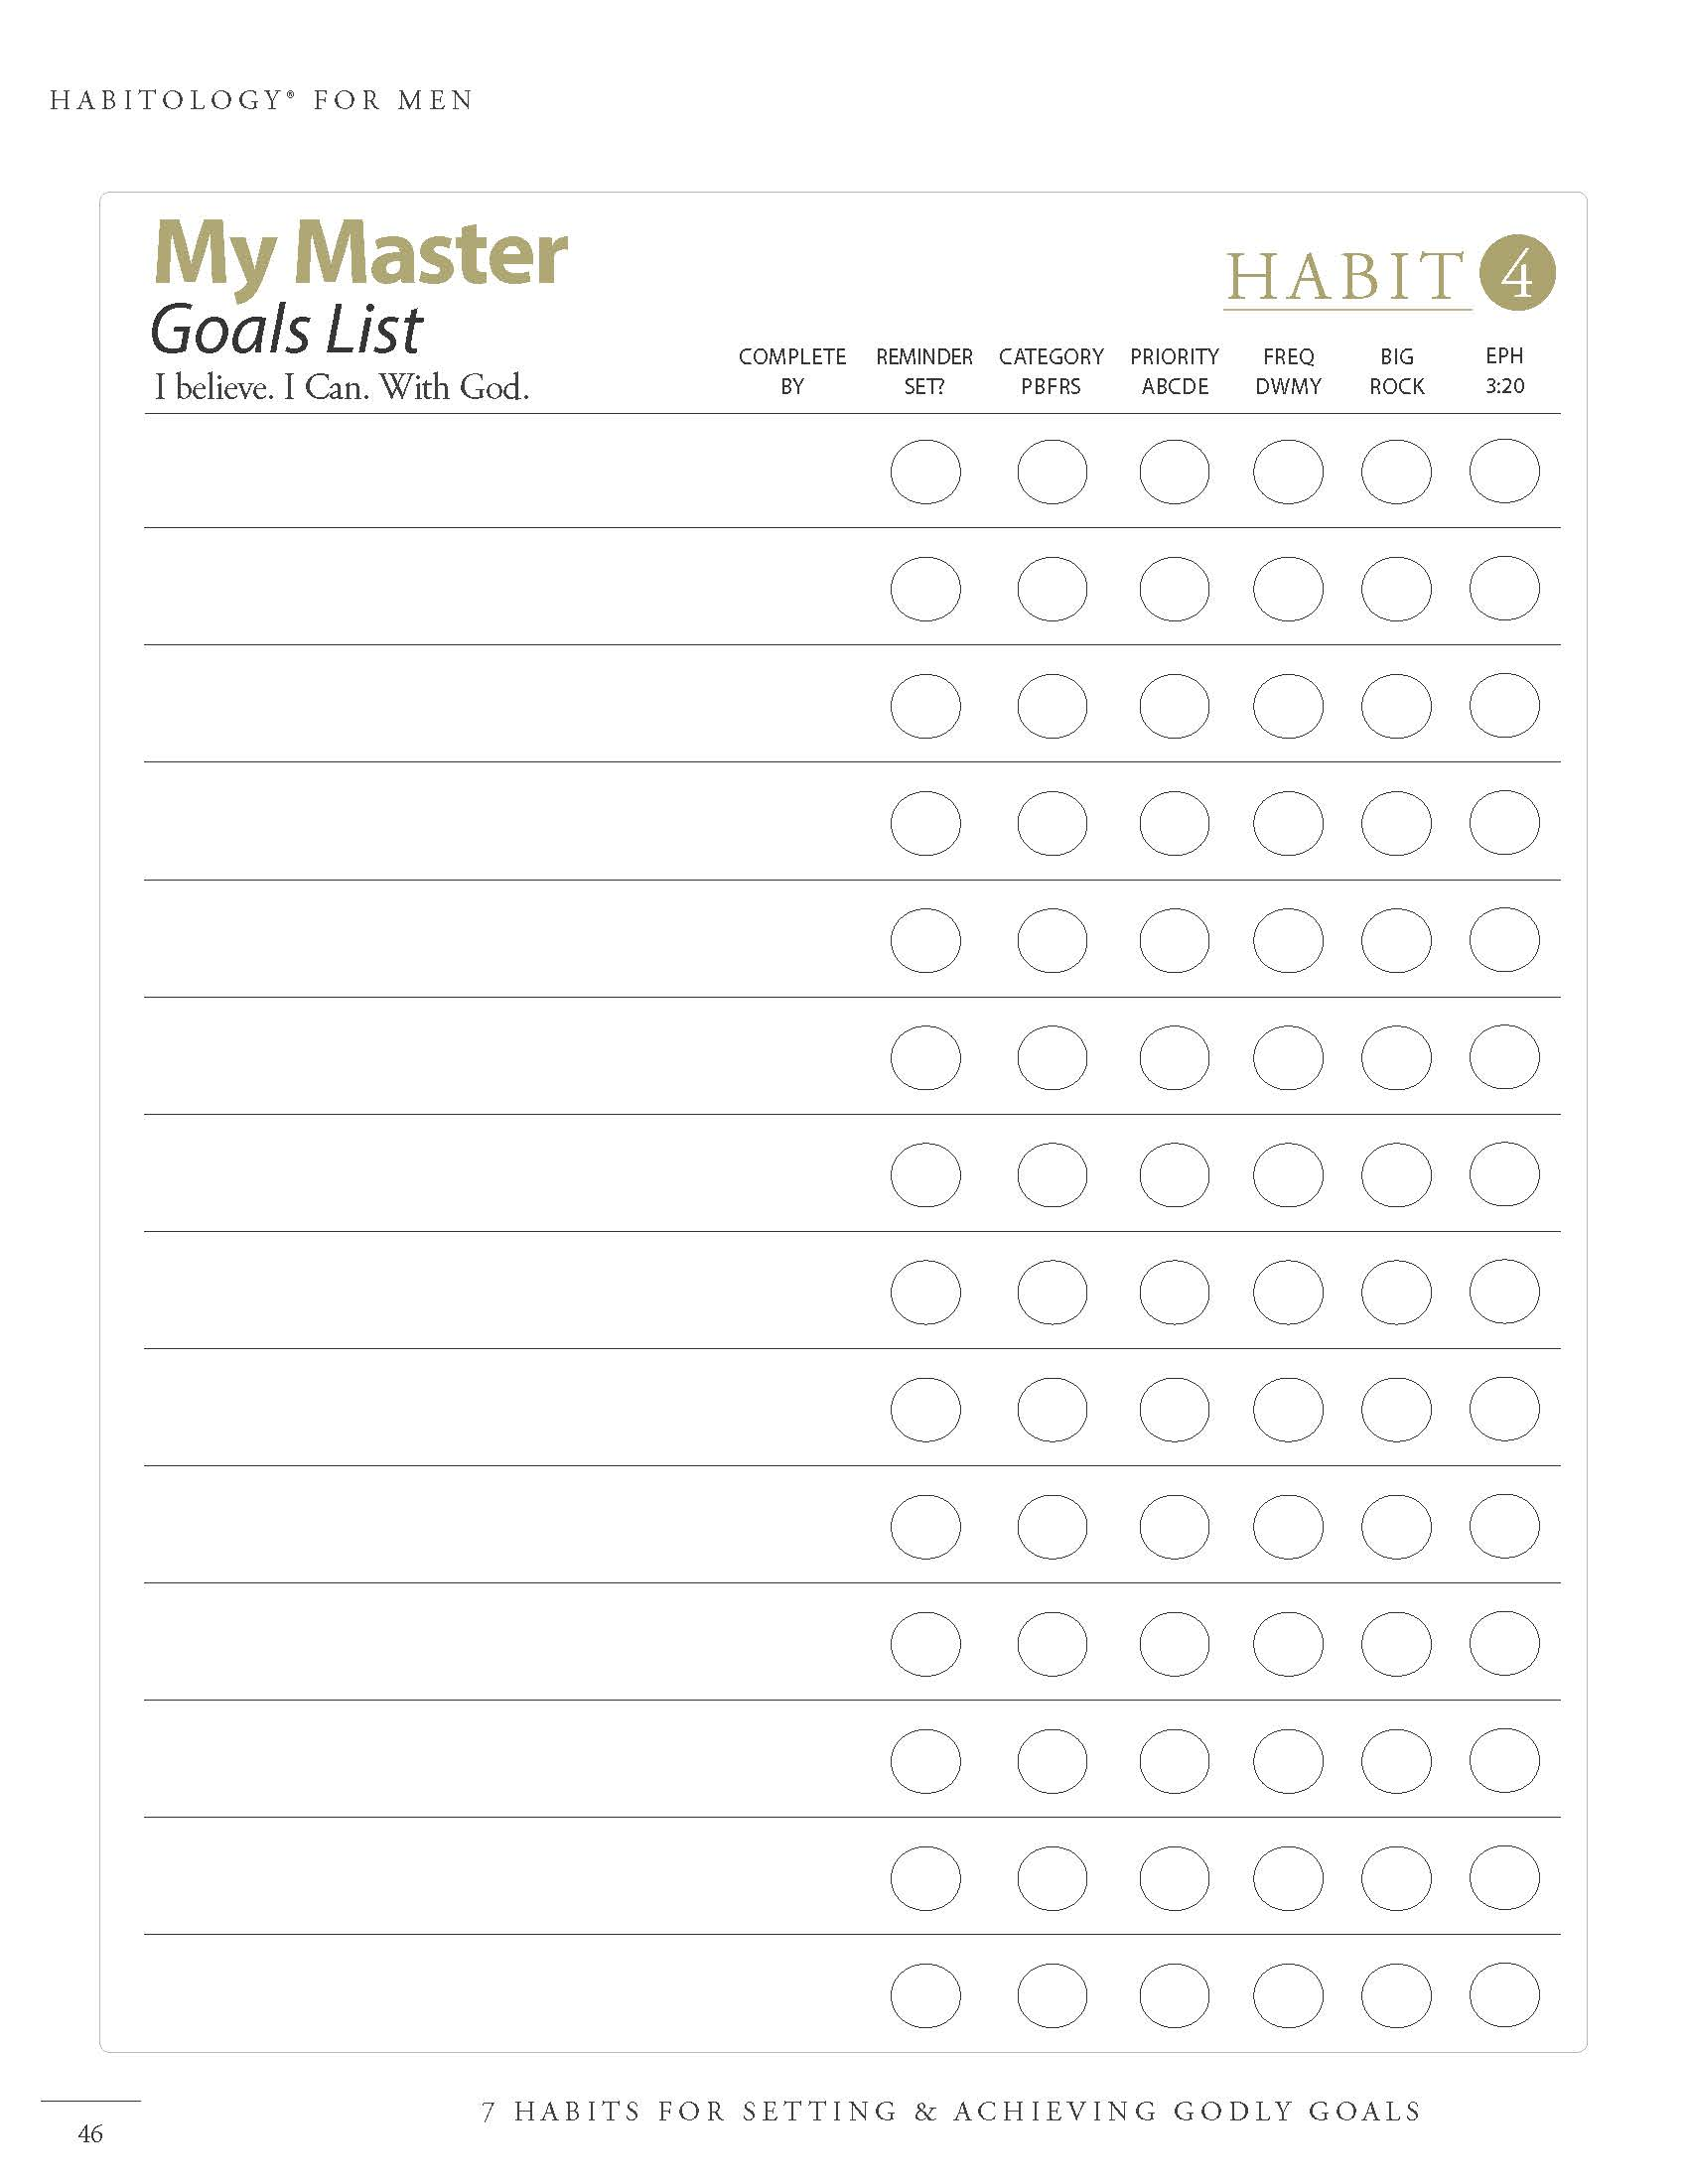 7 Habits For Godly Goals Access Habitology